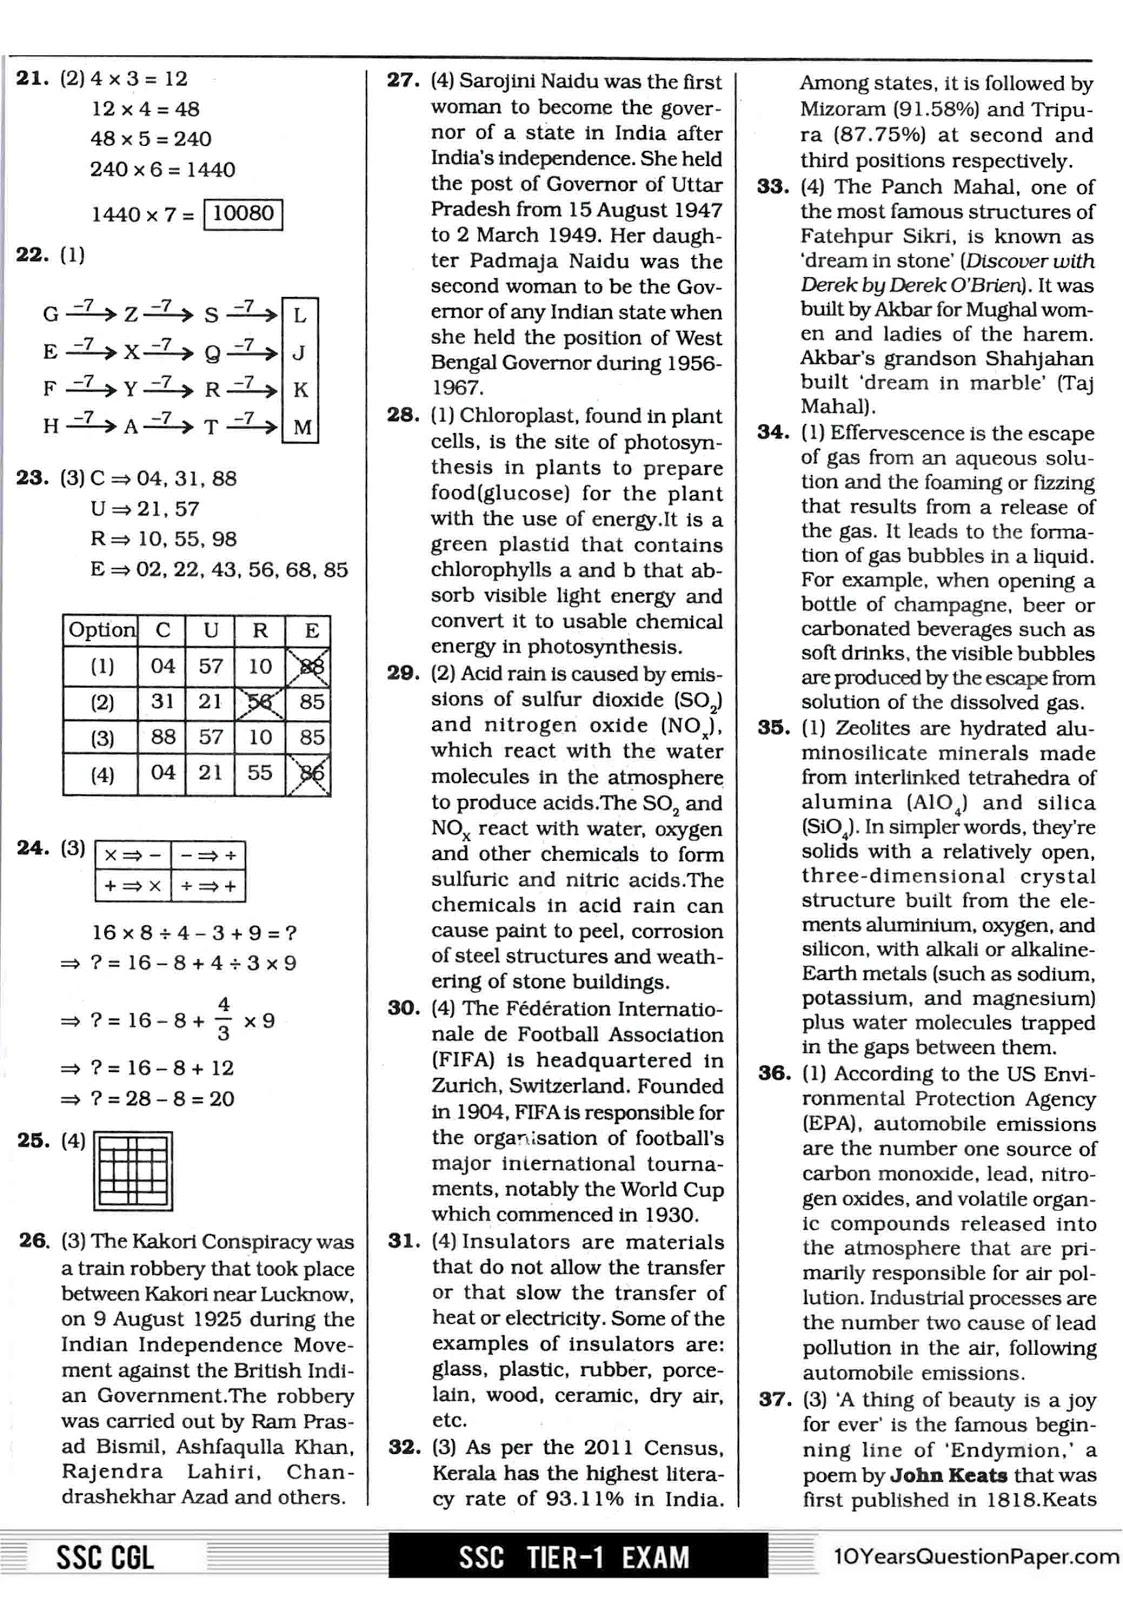 SSC 2016 CGL Question Paper